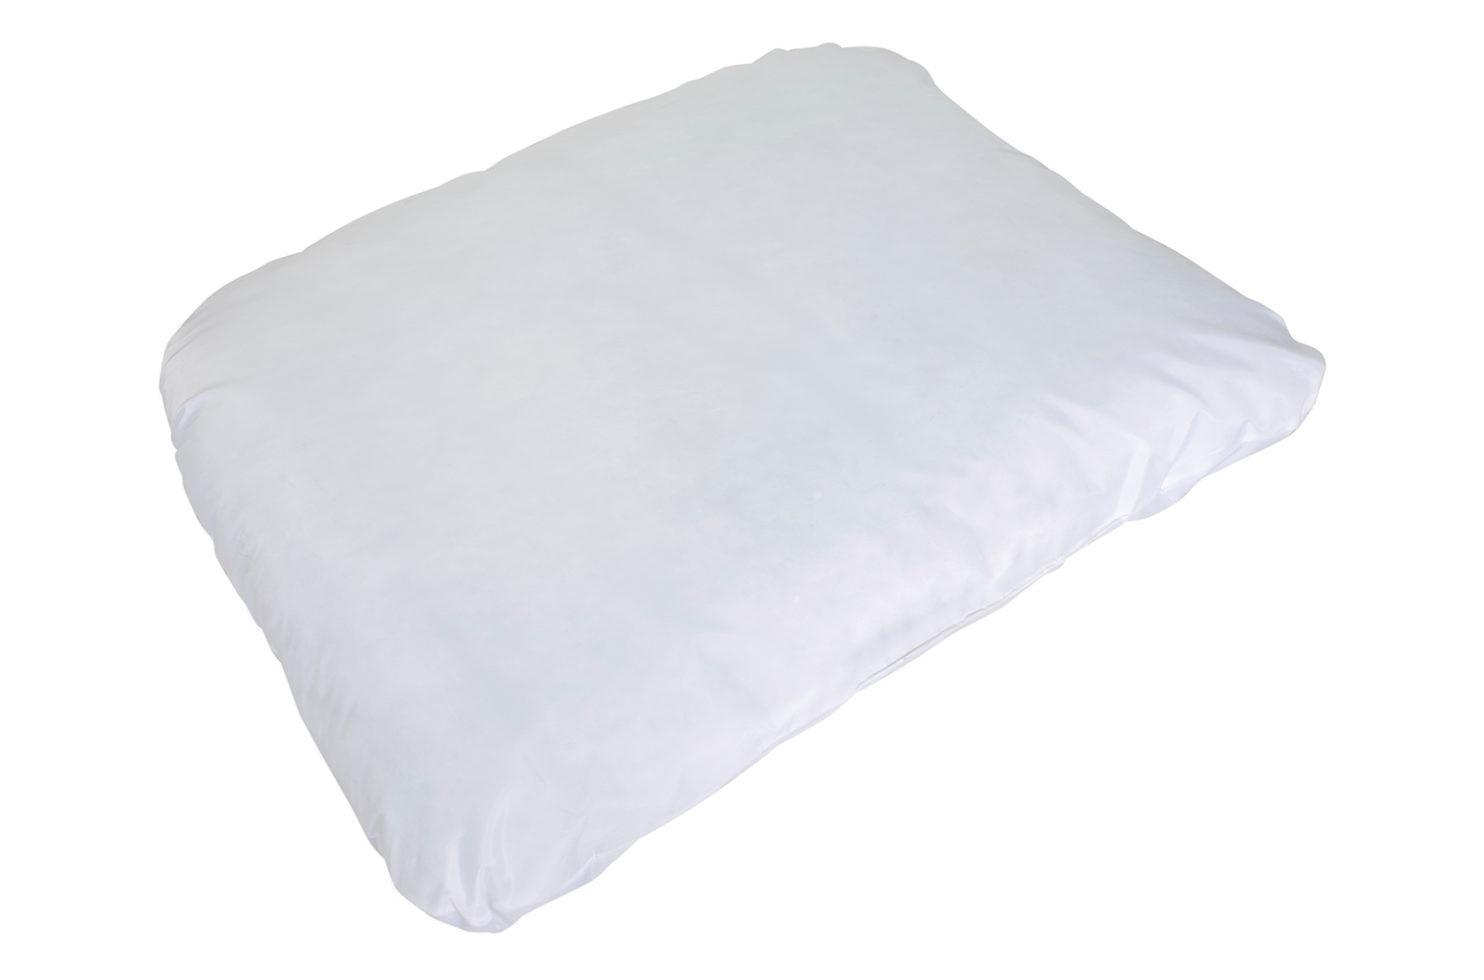 capri sofa frame 620FT094P2 dtl2 back cushion